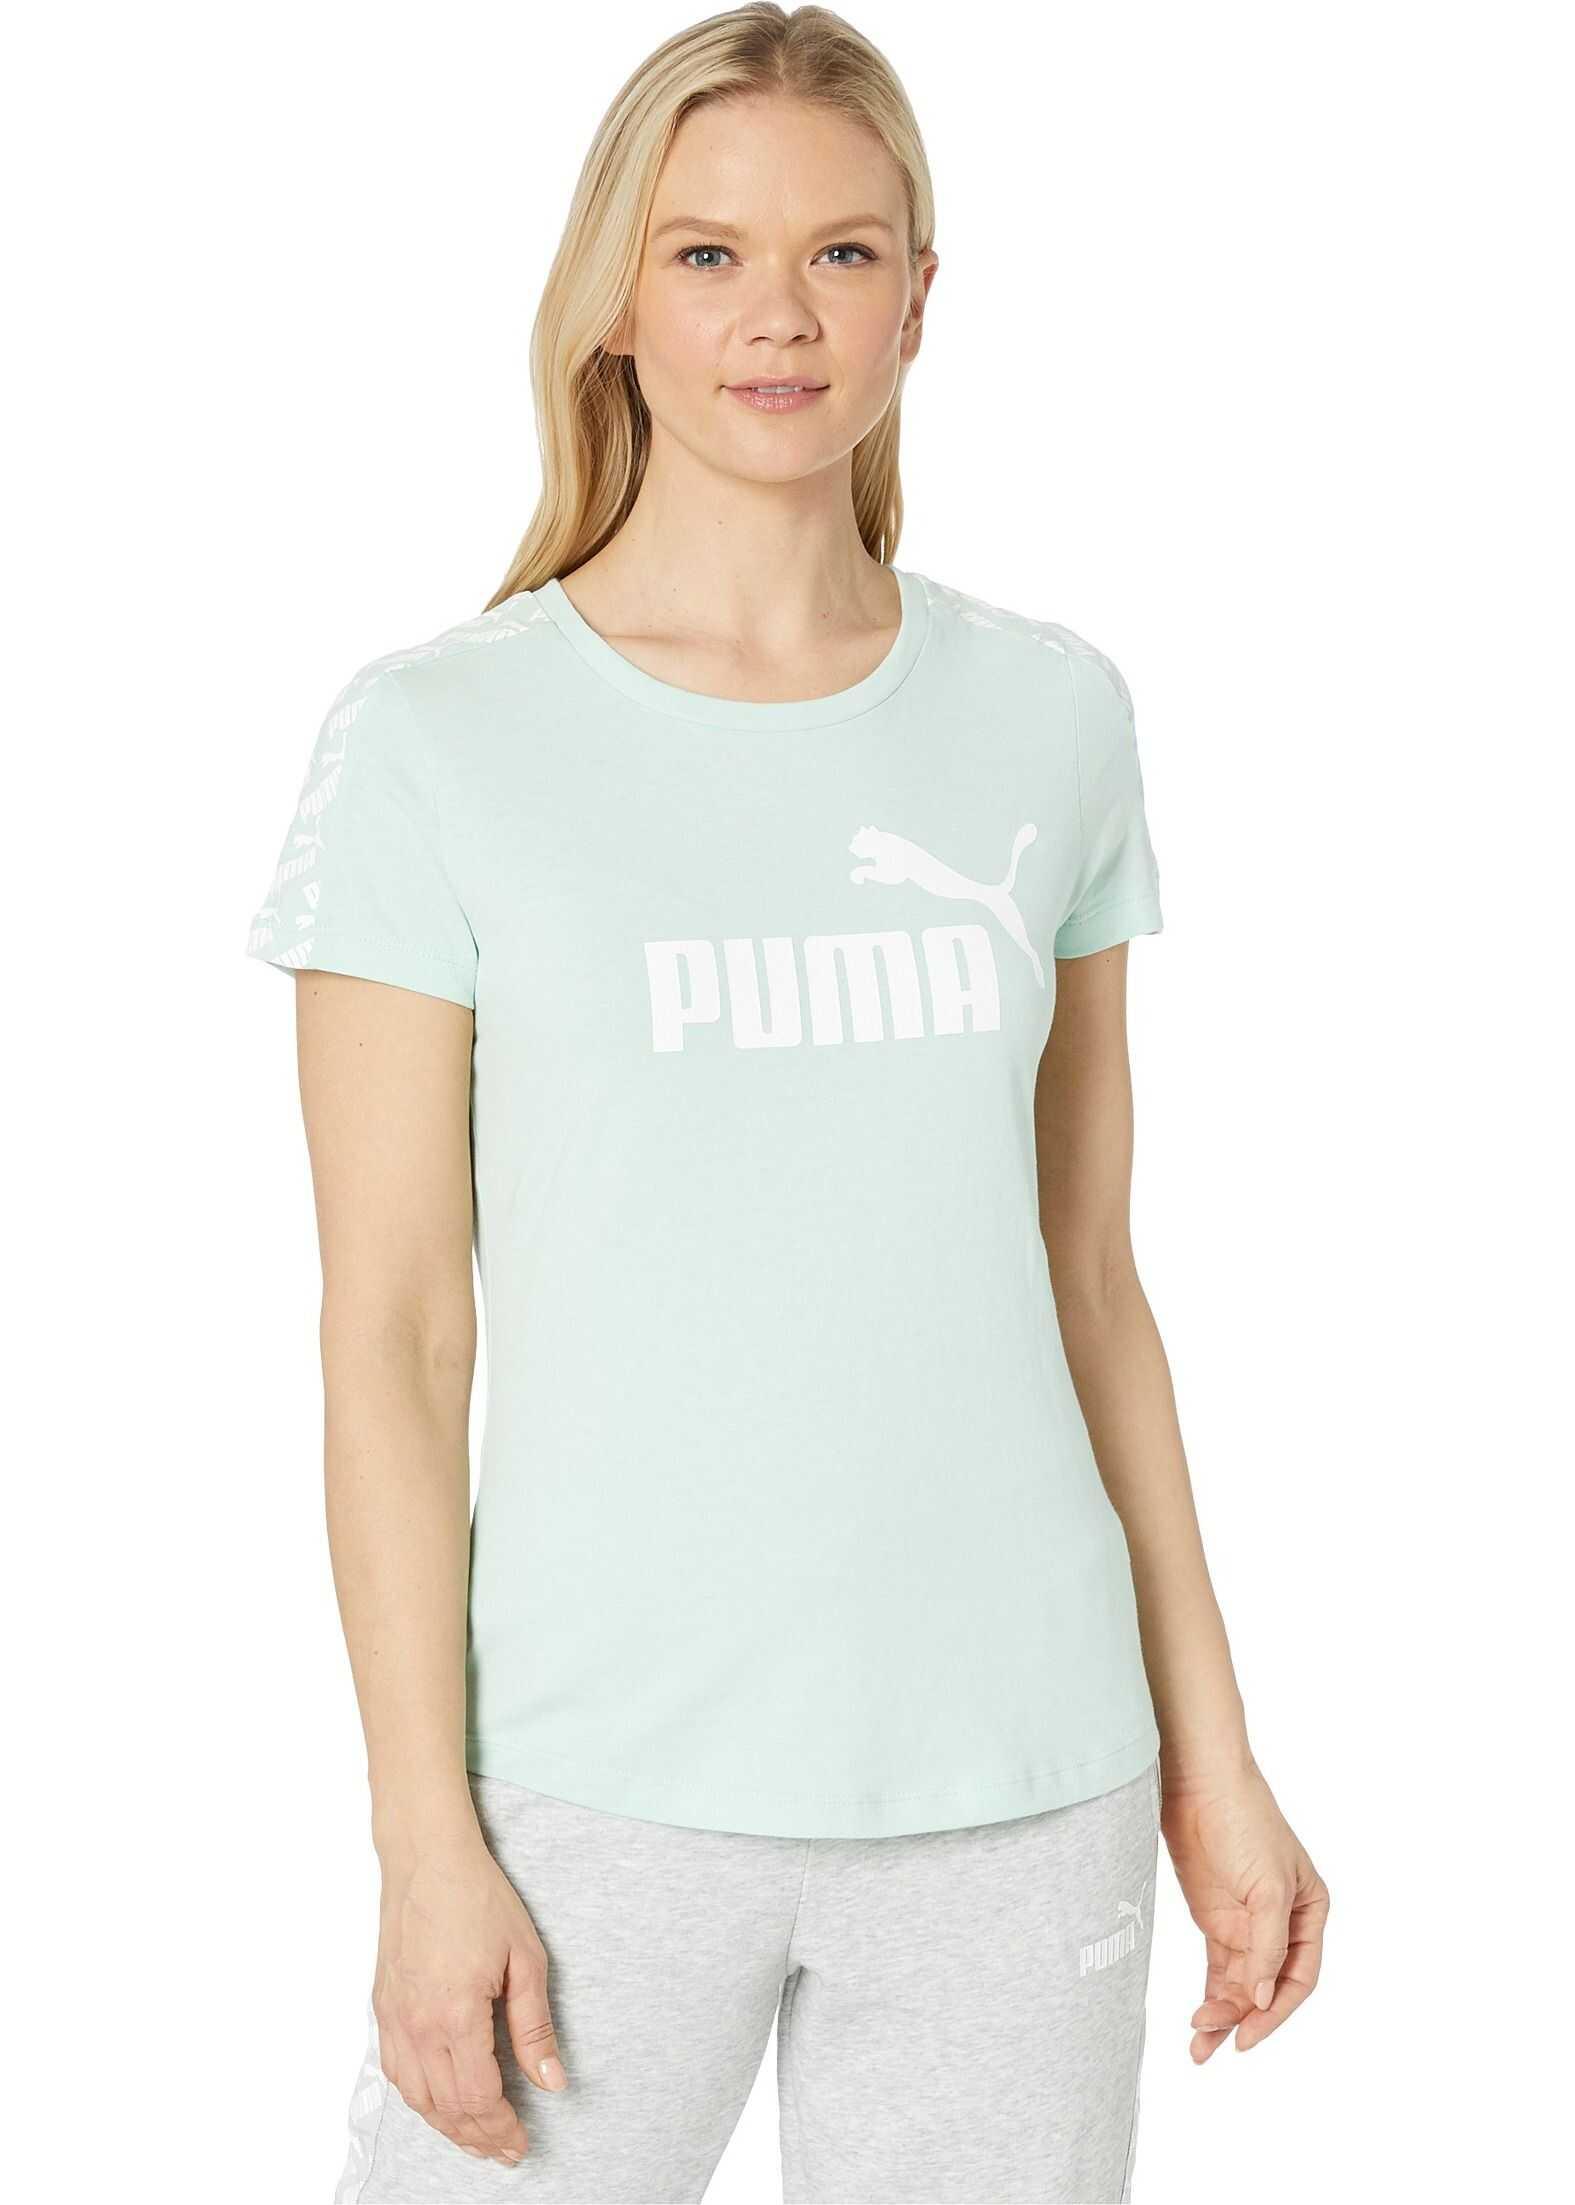 PUMA Amplified Tee Mist Green